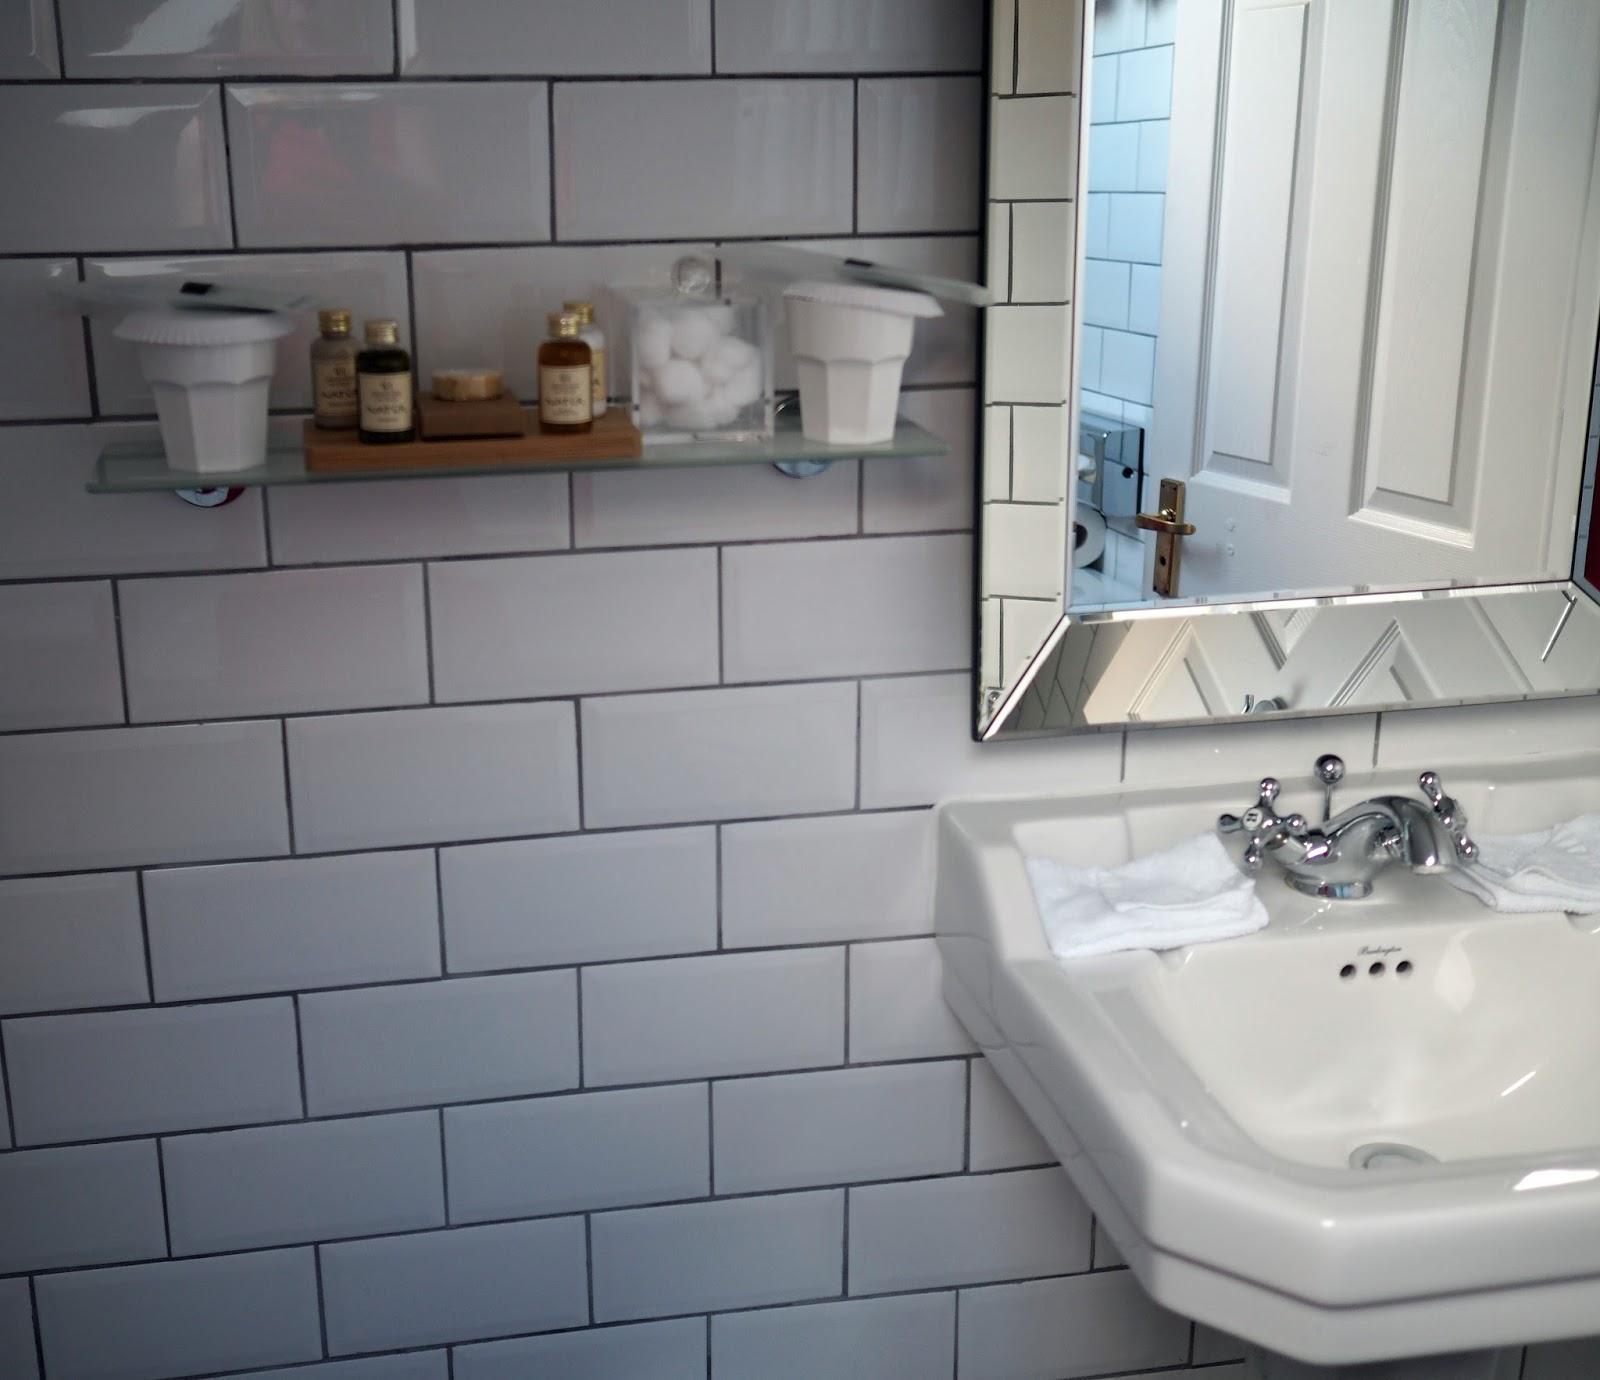 York Hotel suite bedroom at Monk Bar Hotel, York